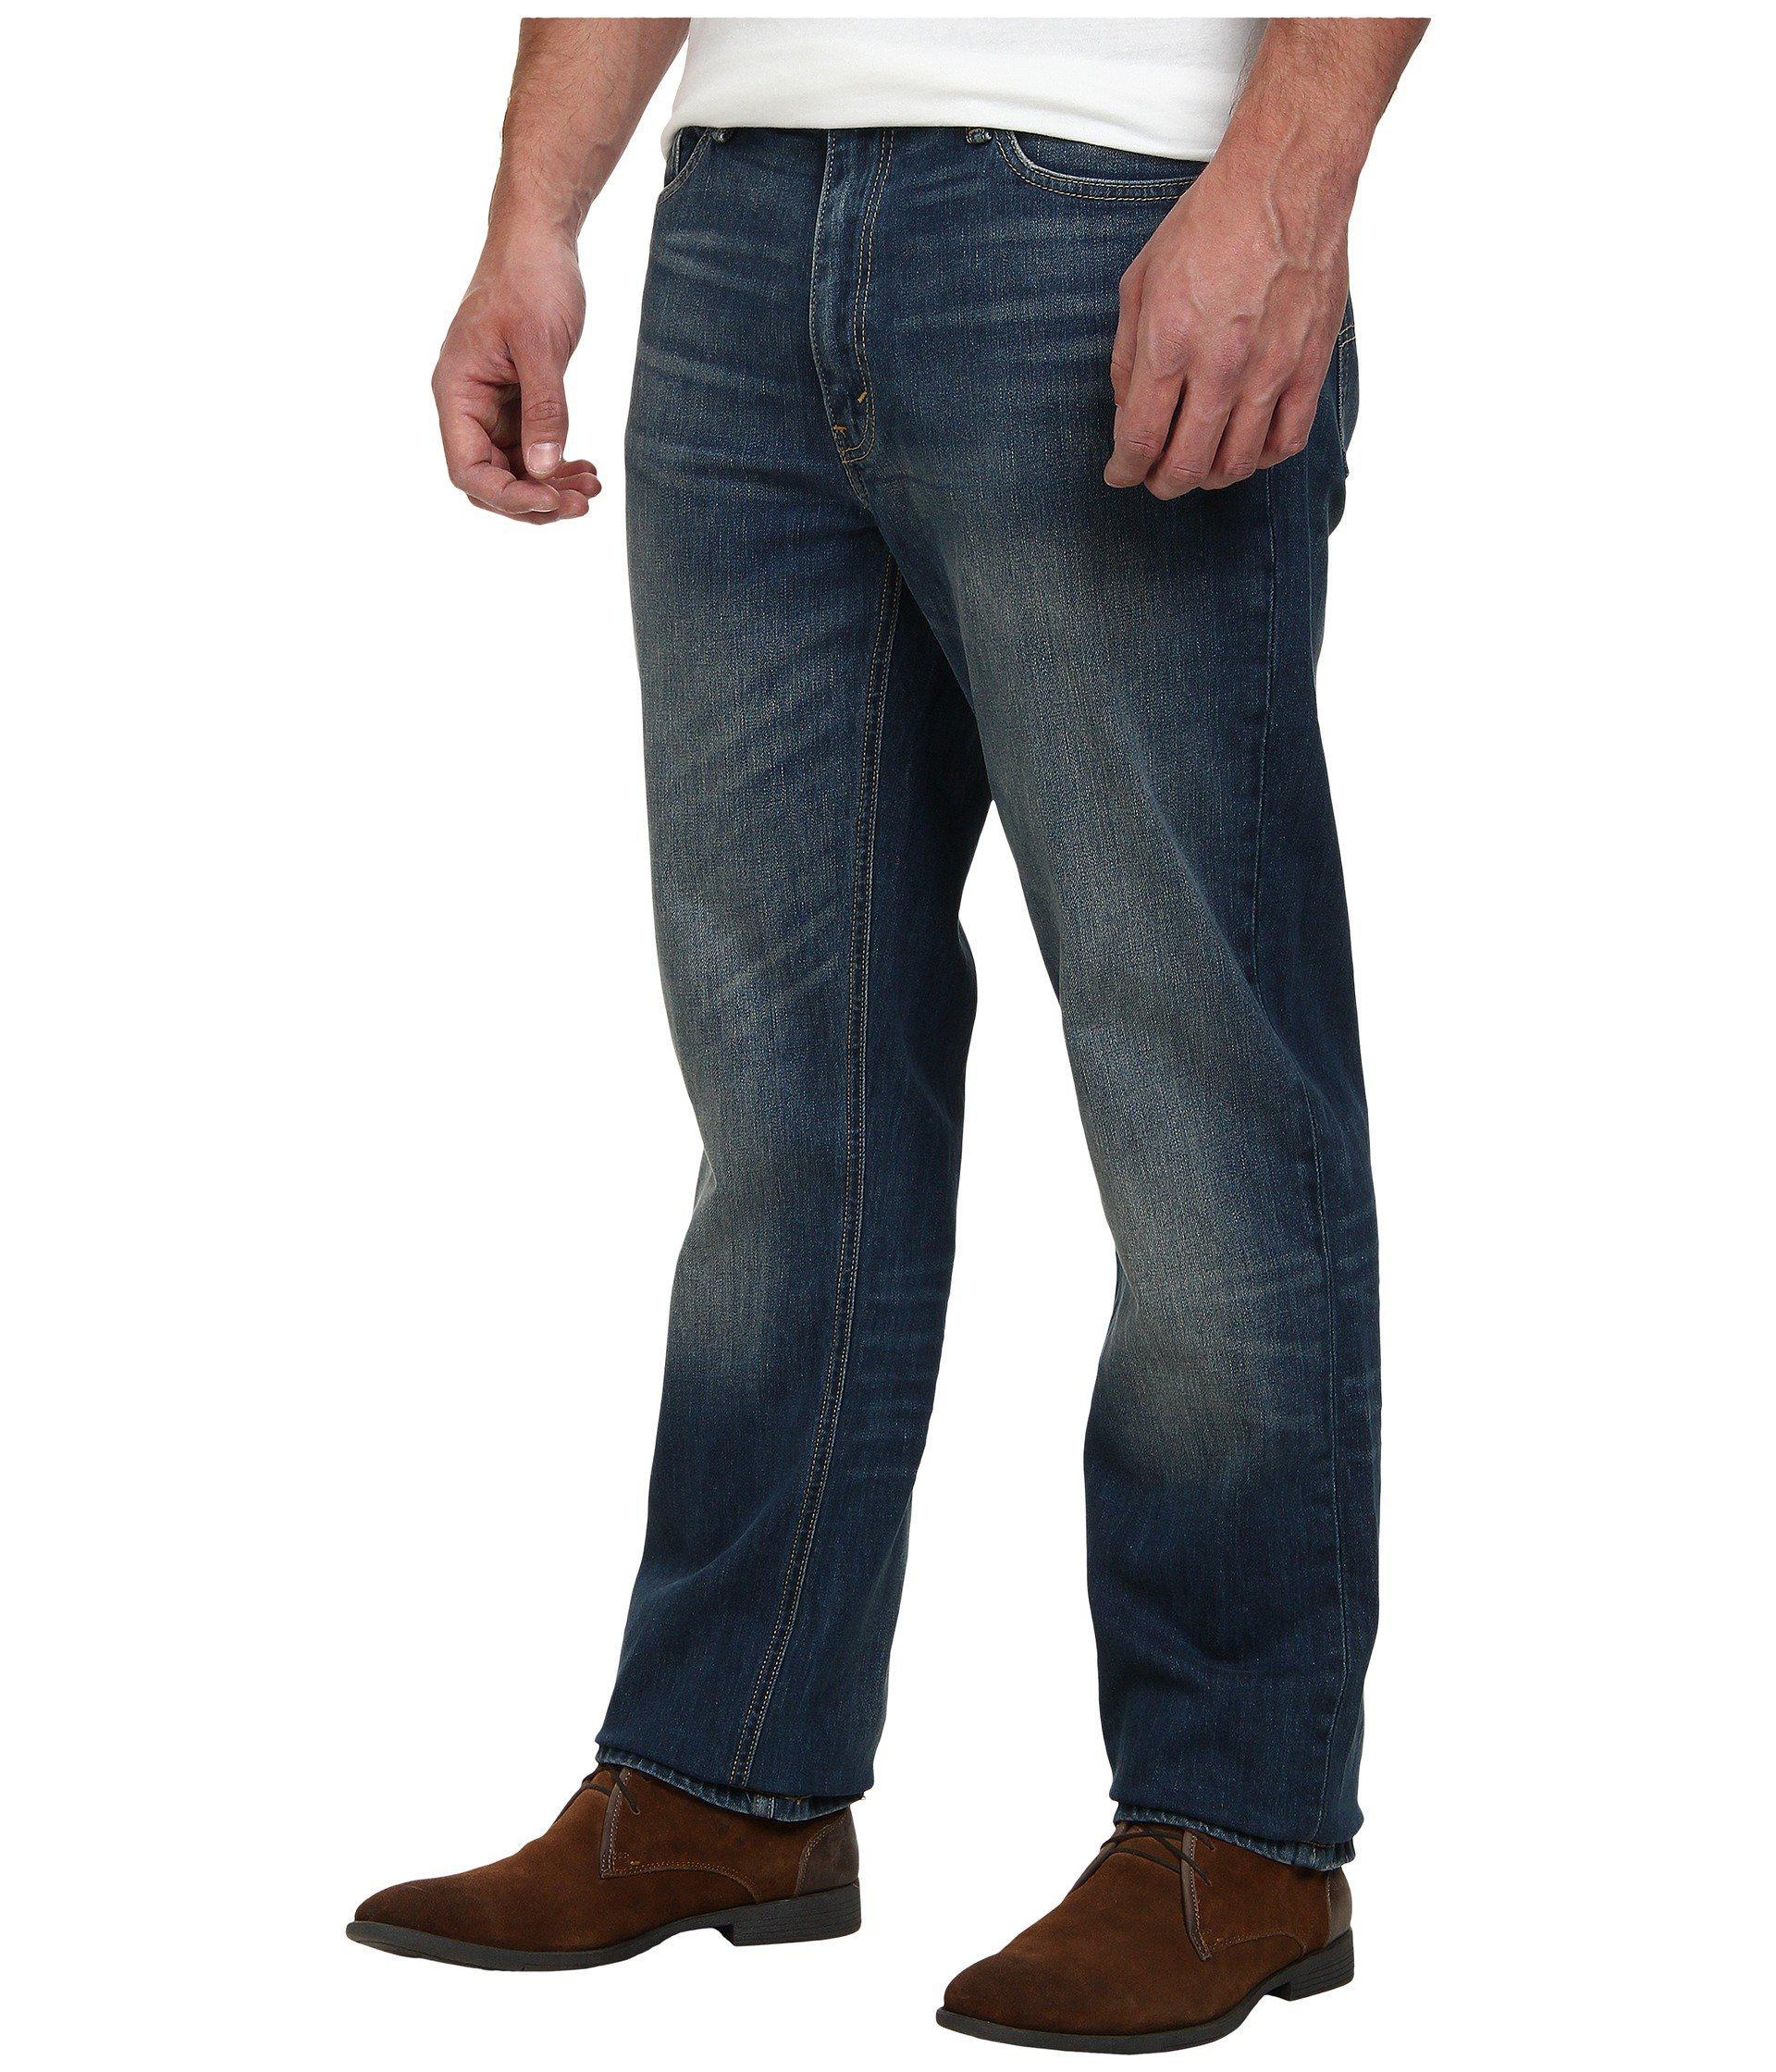 f1b864d3 Lyst - Levi's Levi's(r) Big & Tall Big Tall 541tm Athletic Fit (carbon Ink  Cruz Twill) Men's Jeans in Blue for Men